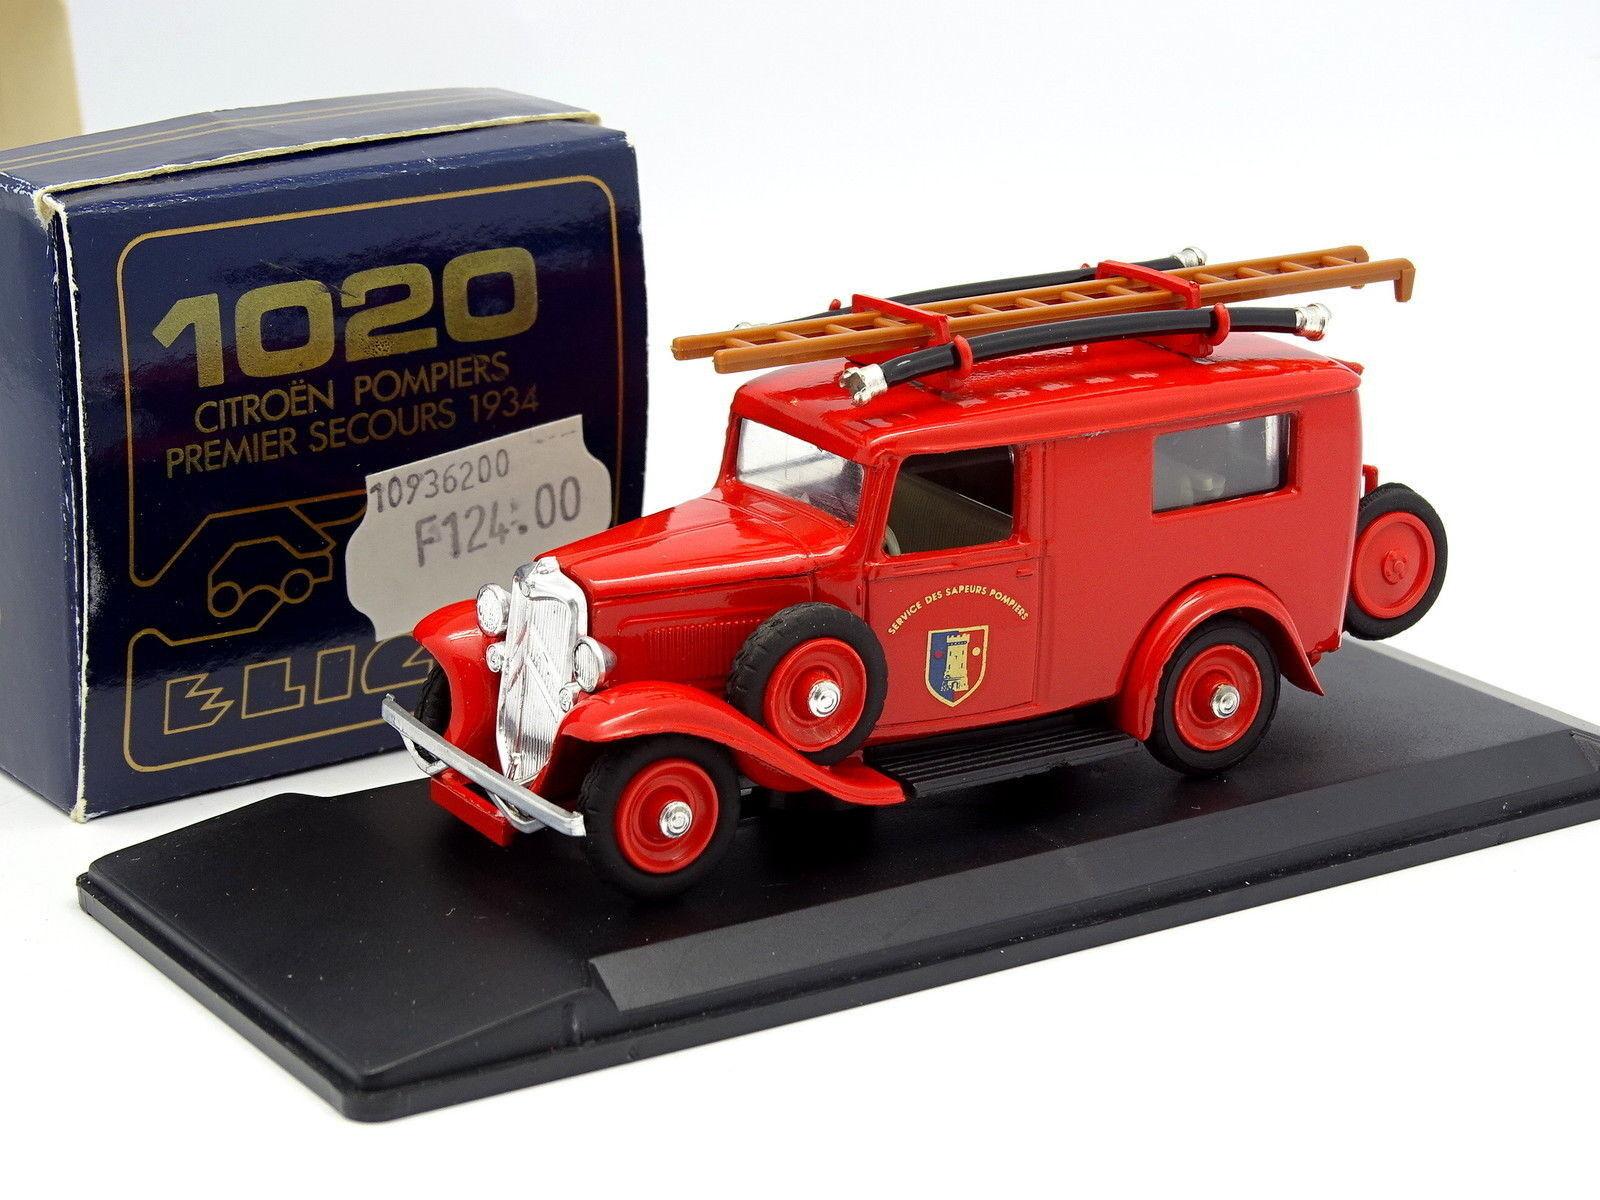 Eligor 1 43 - citroen citroen citroen 500KG 1934 Feuerwehr 9362d3